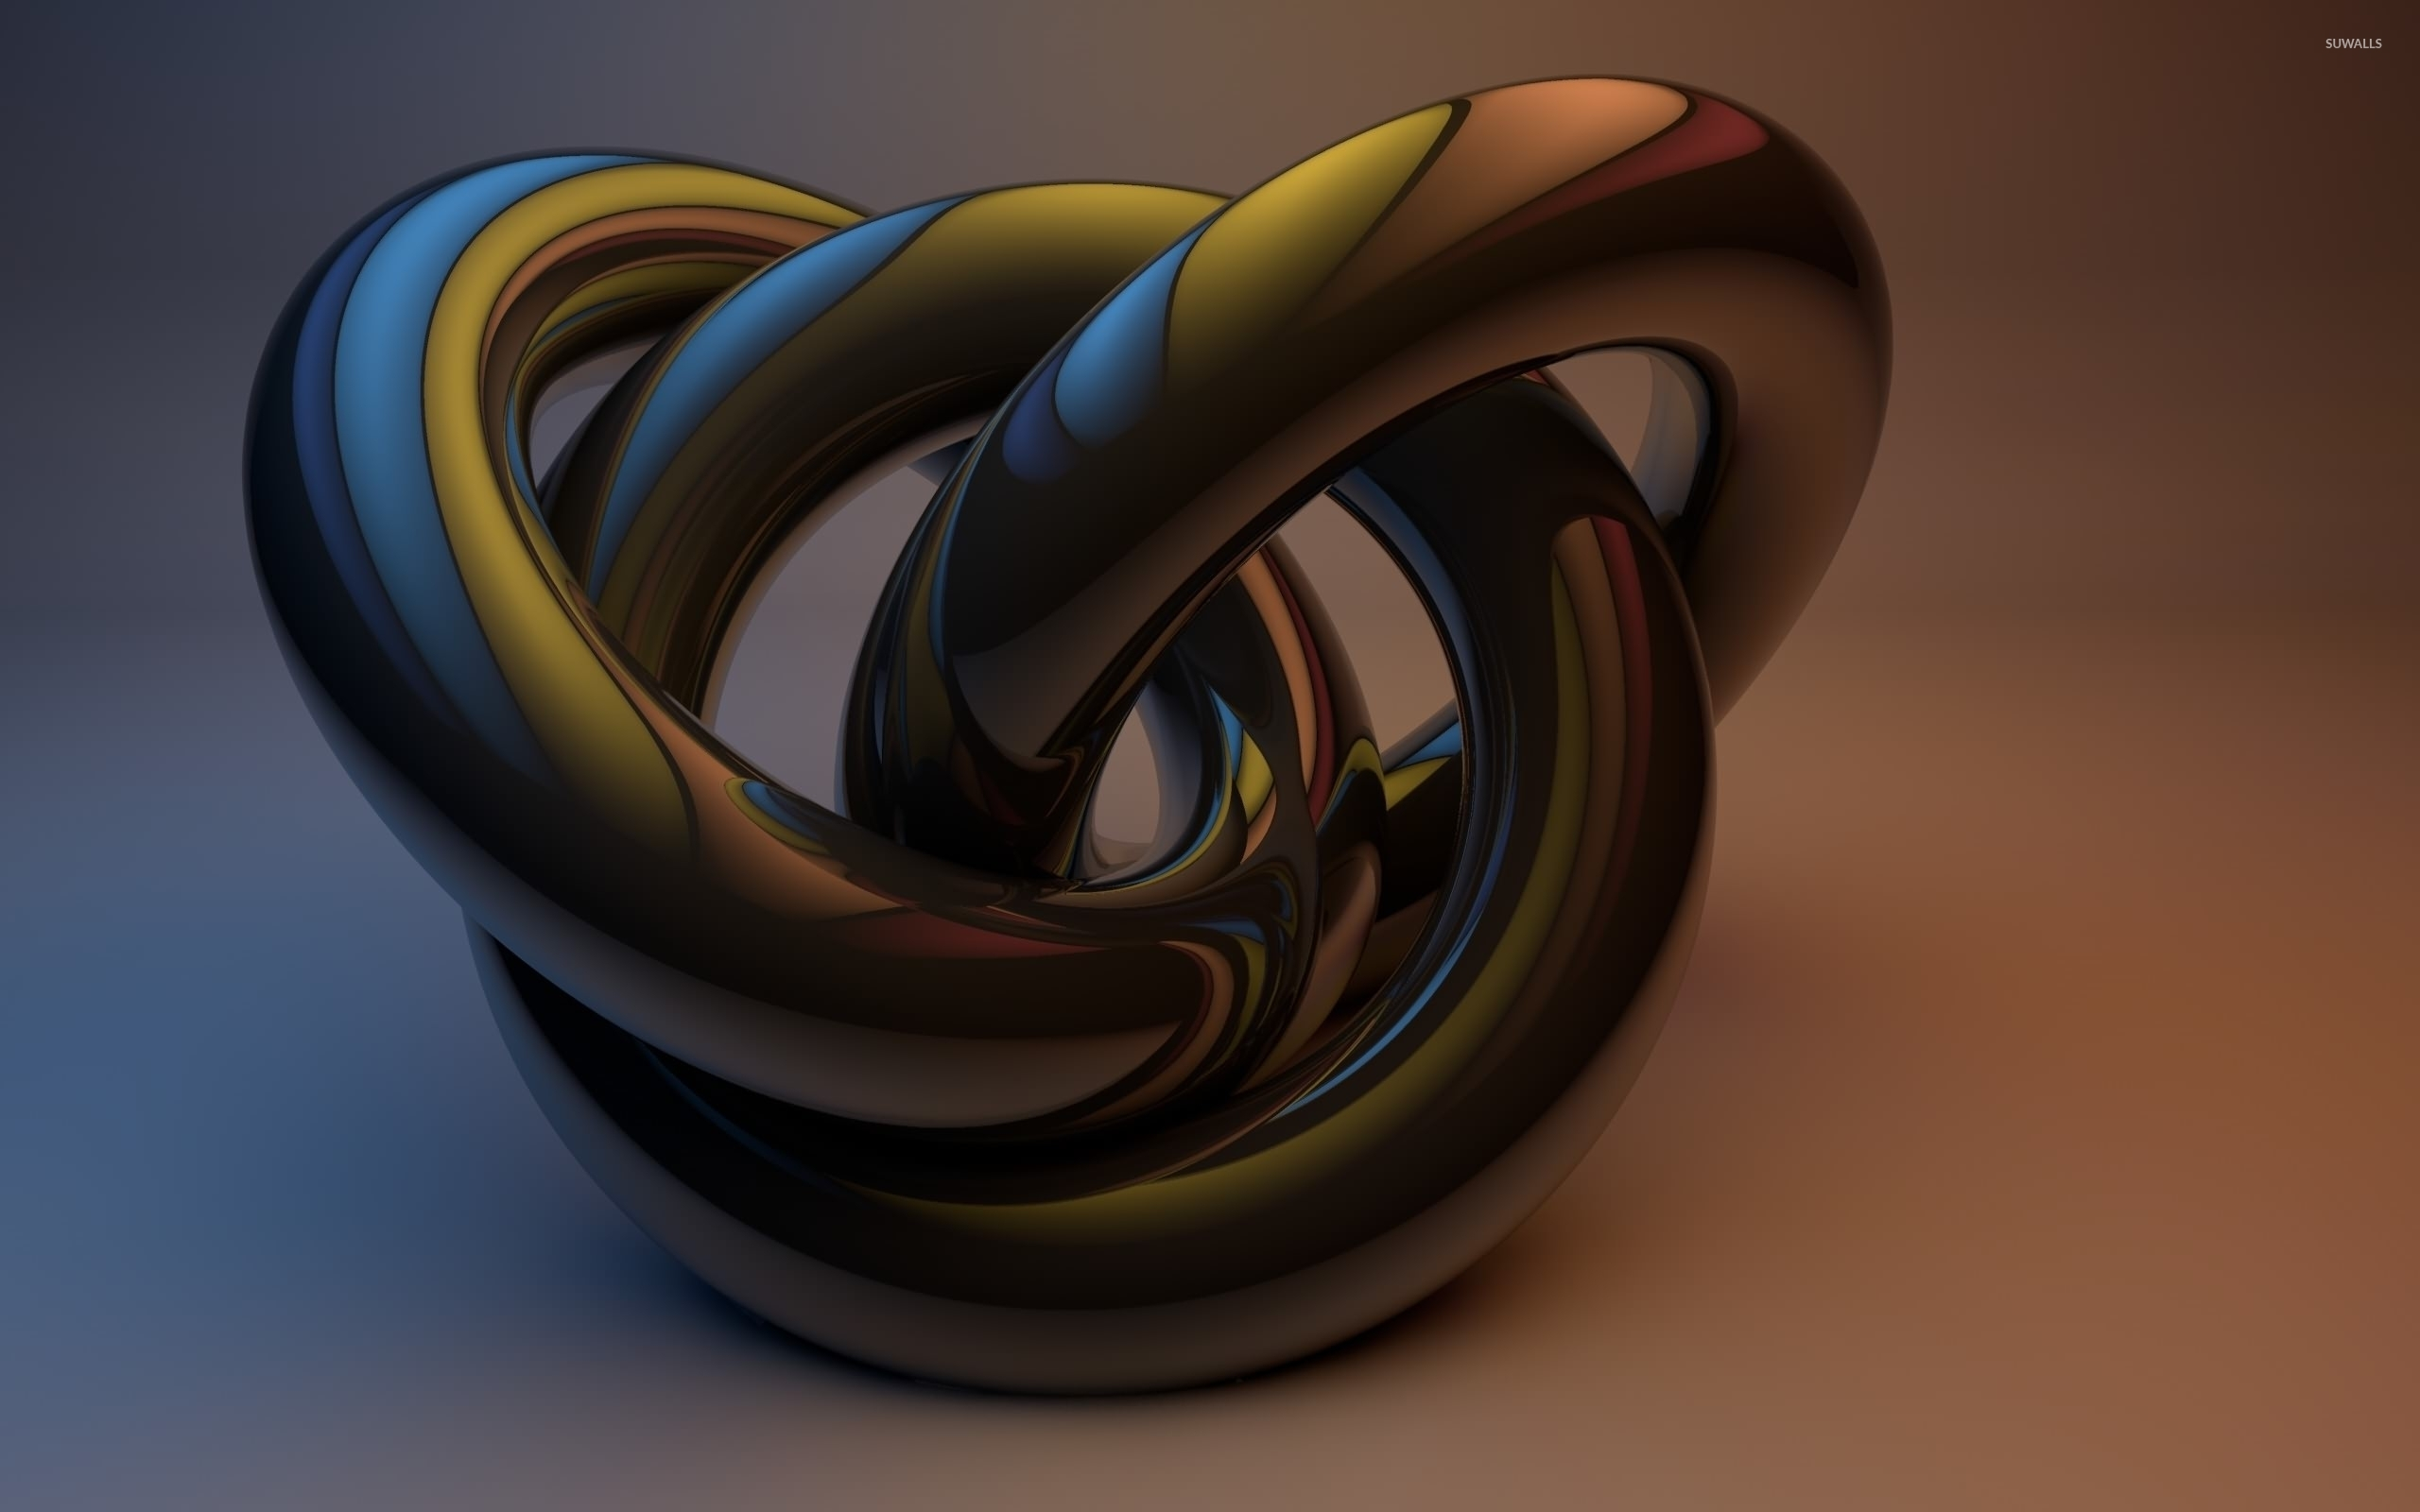 connected metallic rings wallpaper - 3d wallpapers - #52884